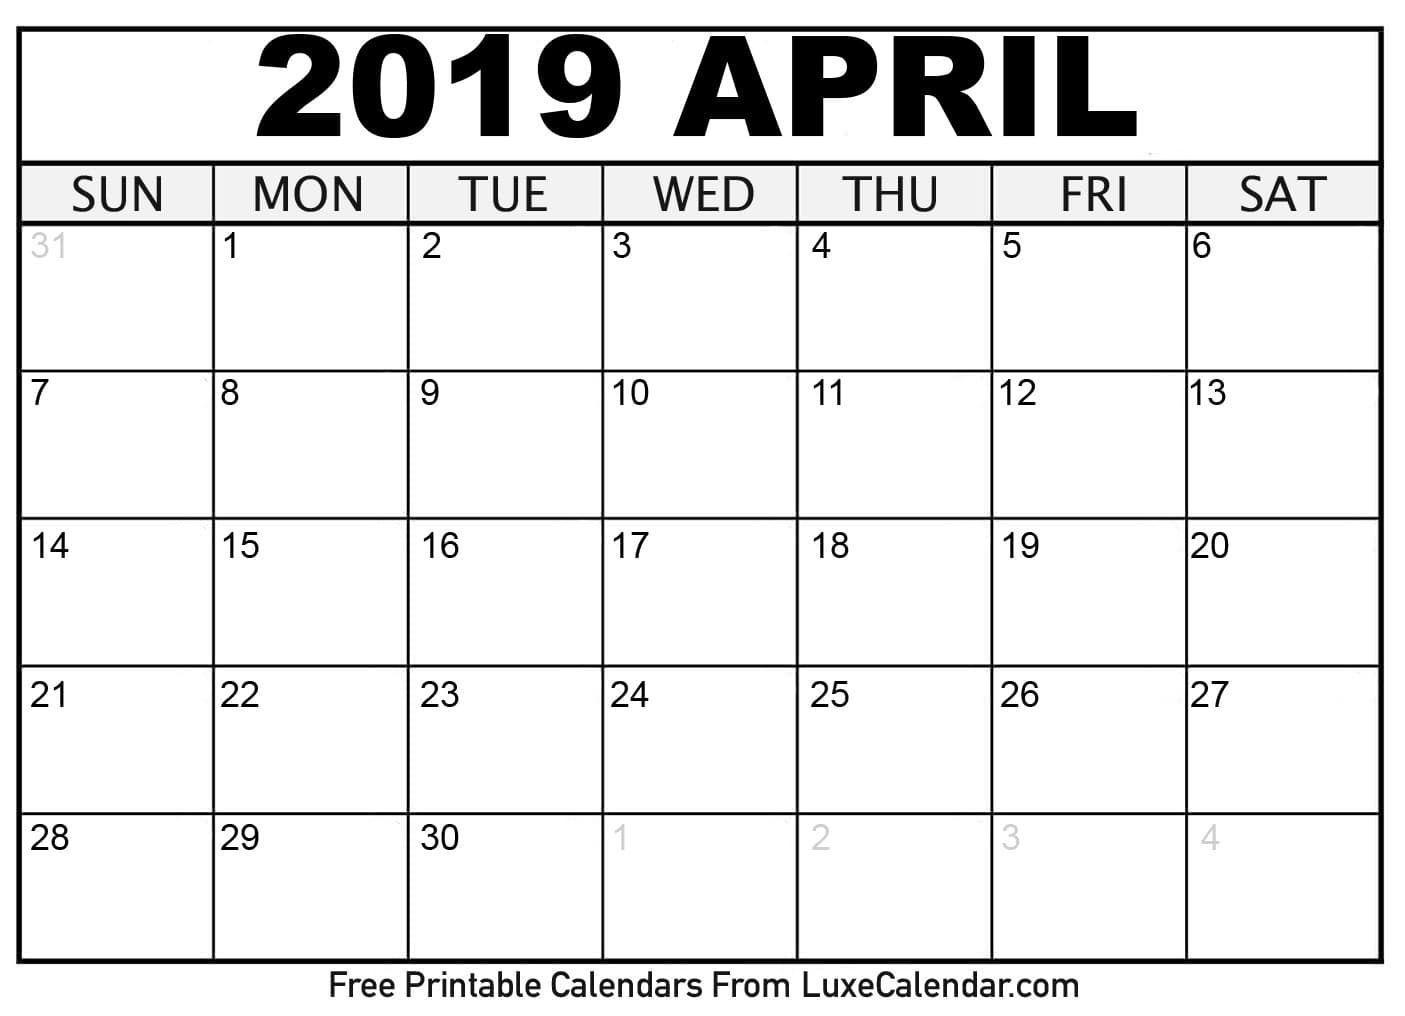 Collect Chick Fil A 2021 Calendars